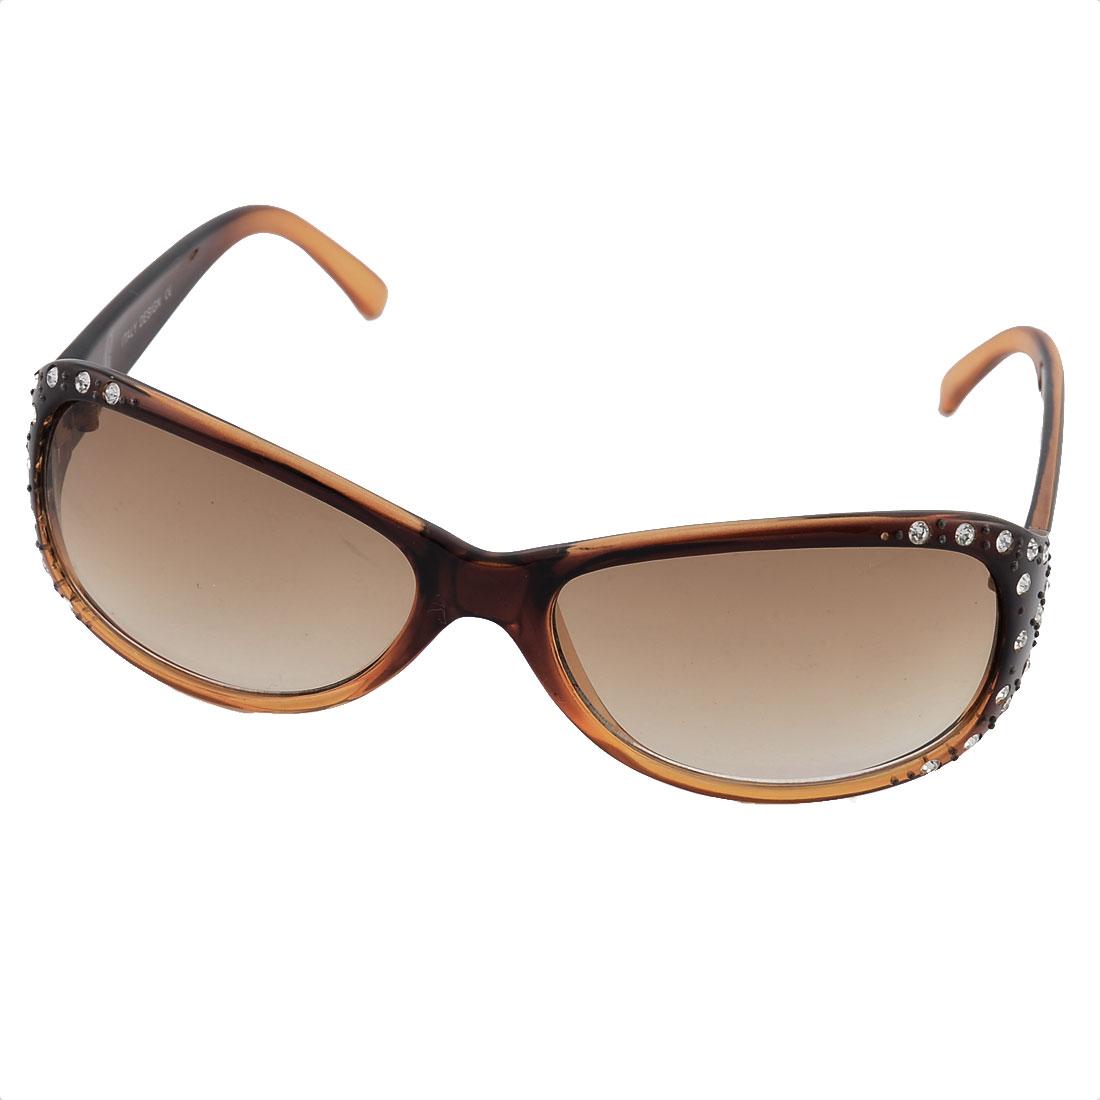 Women Rhinestone Inlaid Full Rim Single Bridge Lens Outdoor Driving Sunglasses